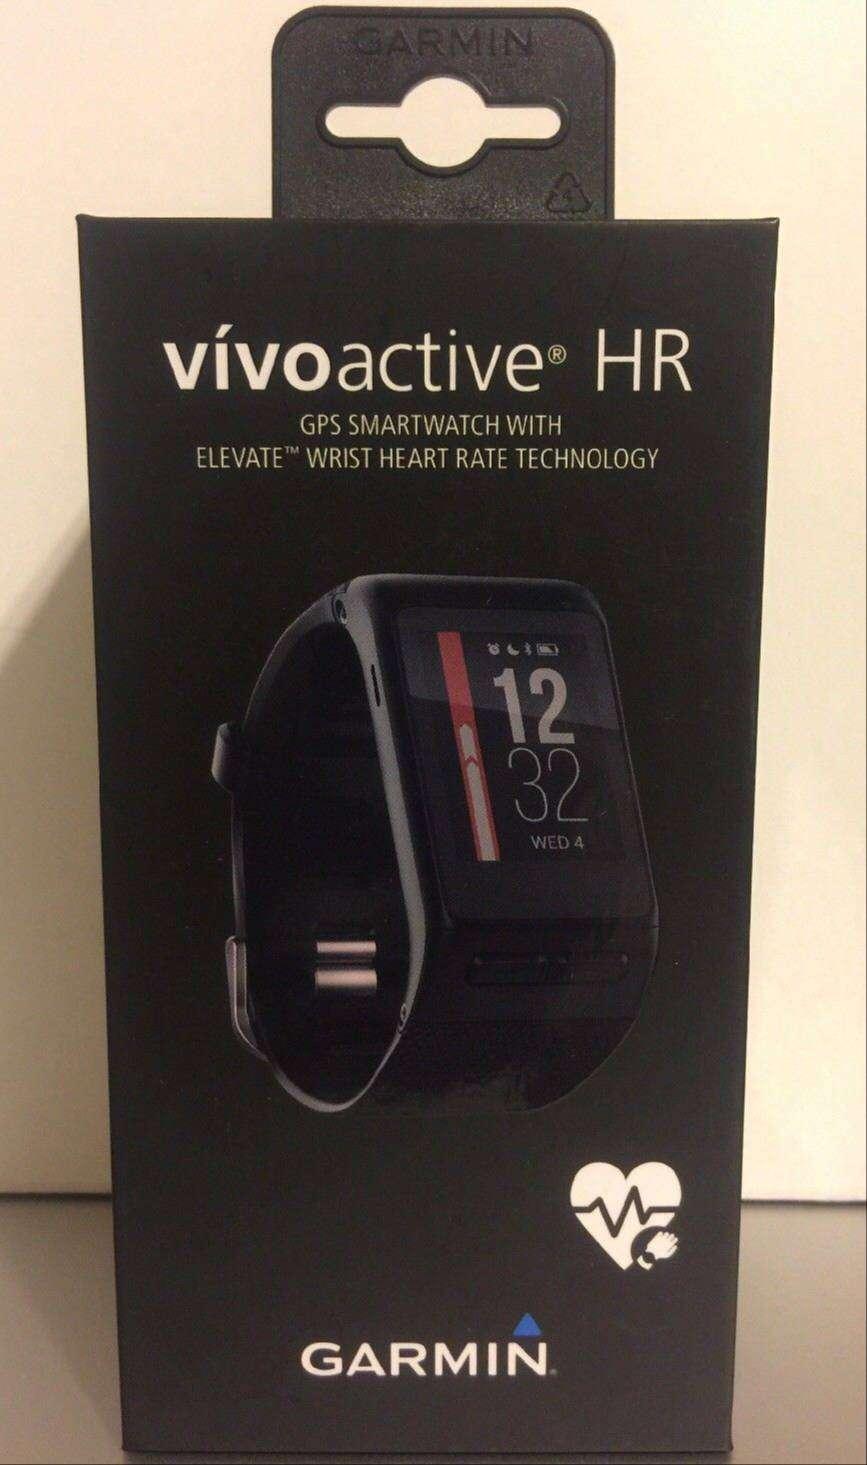 Garmin VivoActive GPS HR